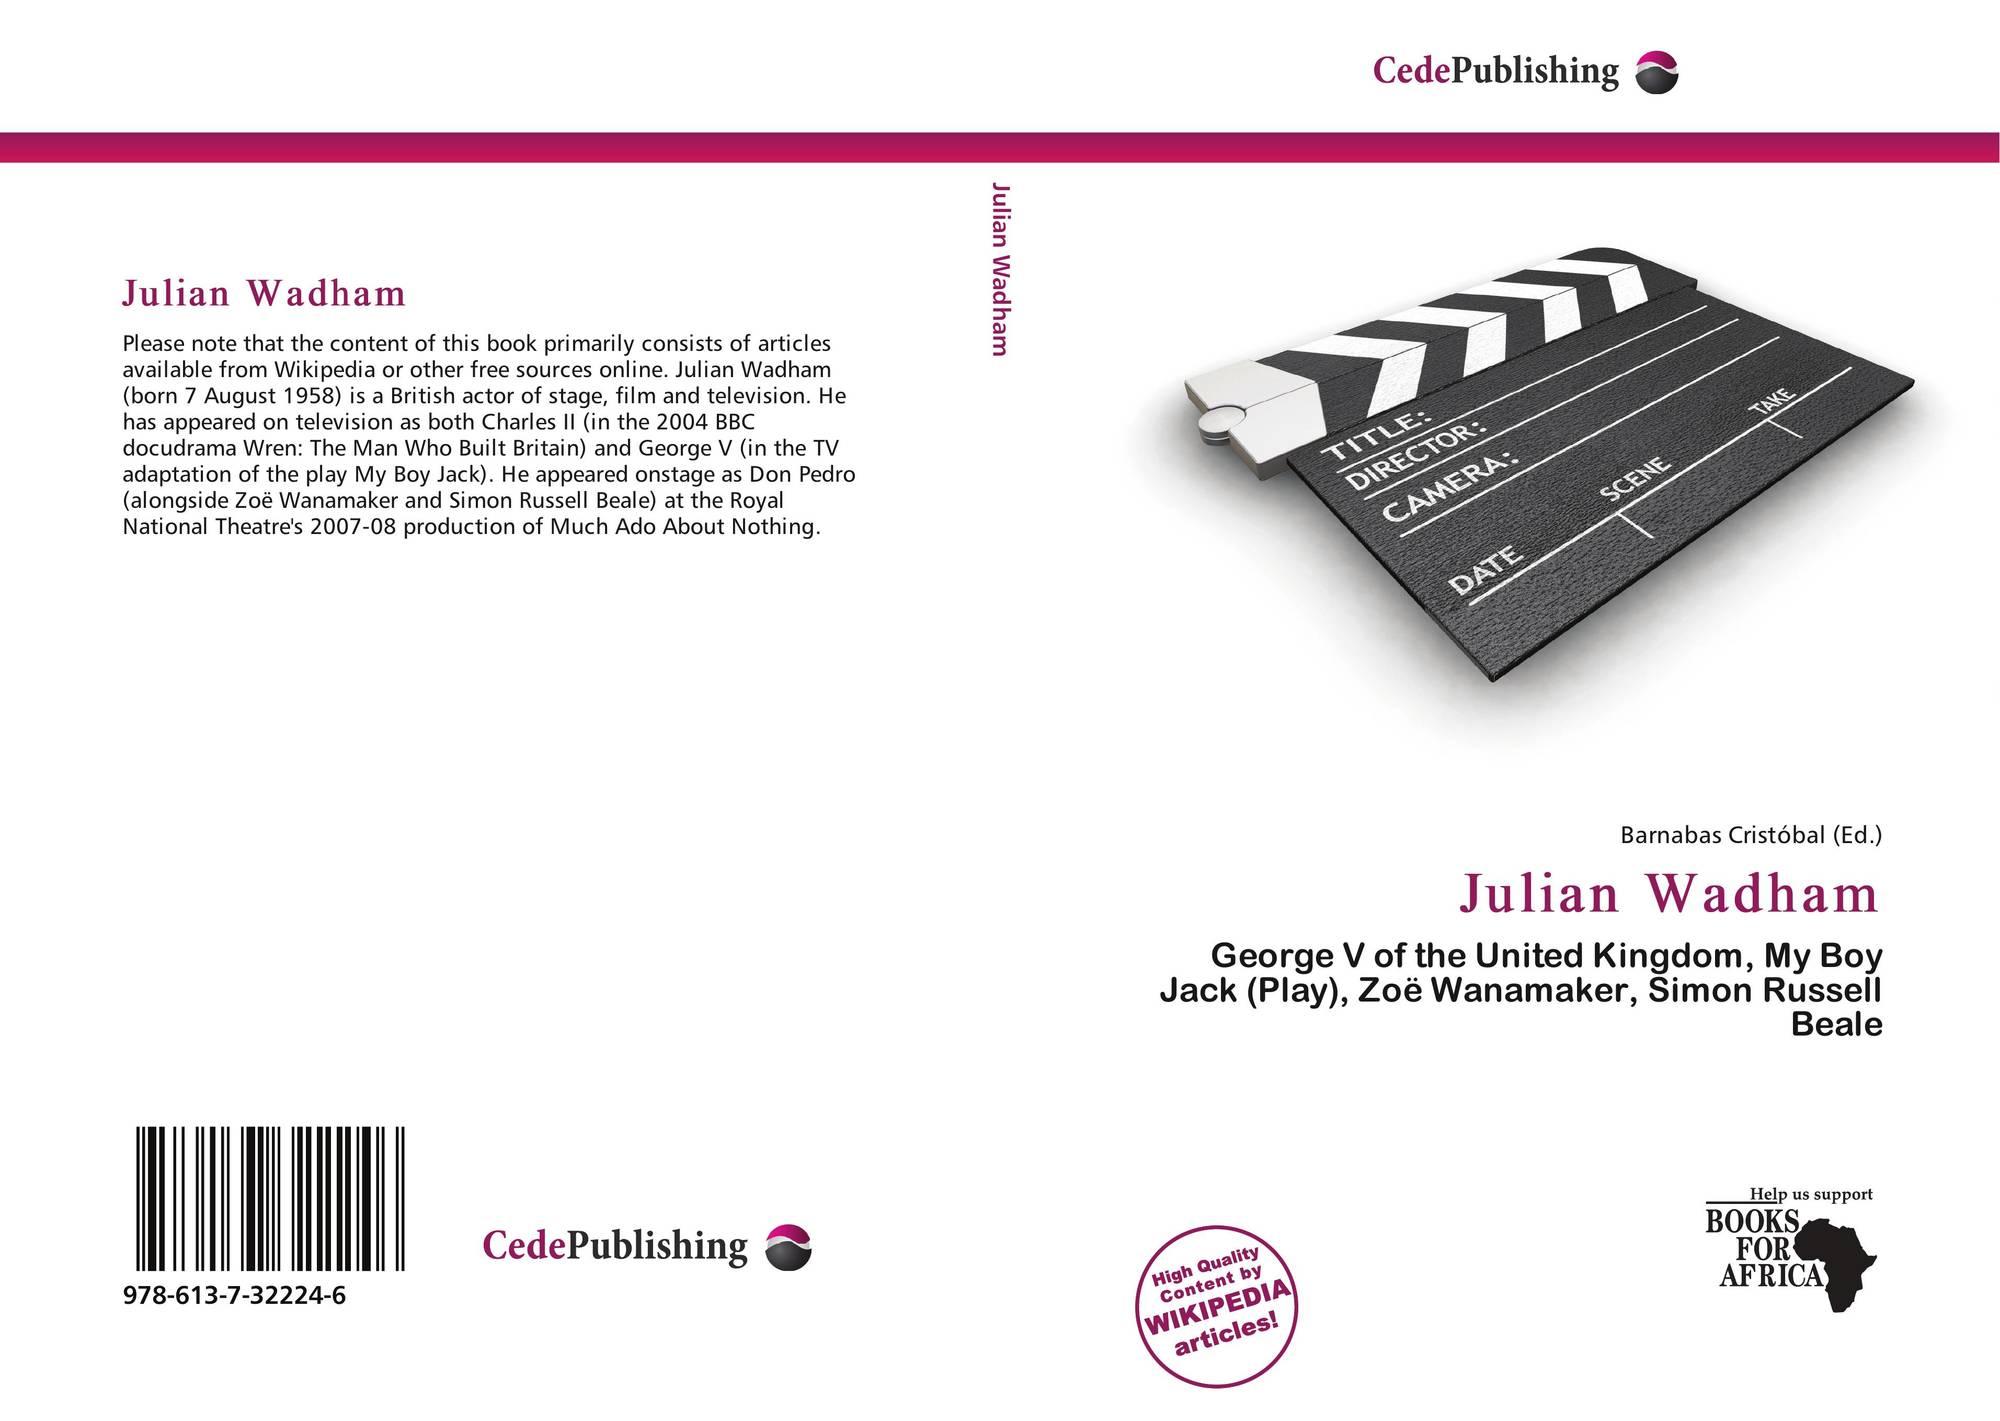 Communication on this topic: Devinn Lane, julian-wadham-born-1958/